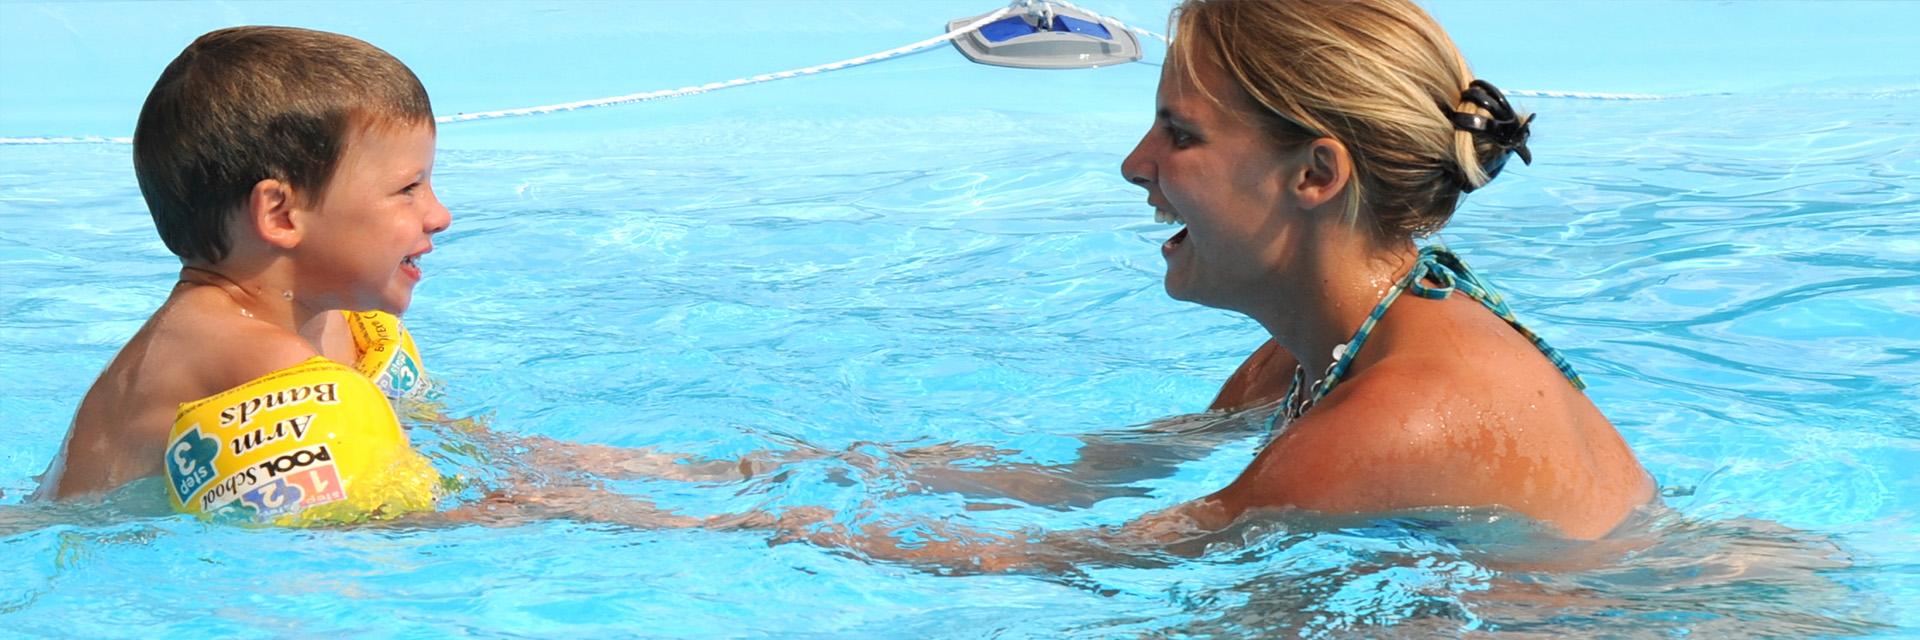 Village_club_vacances_haute-savoie_Berouze-piscine